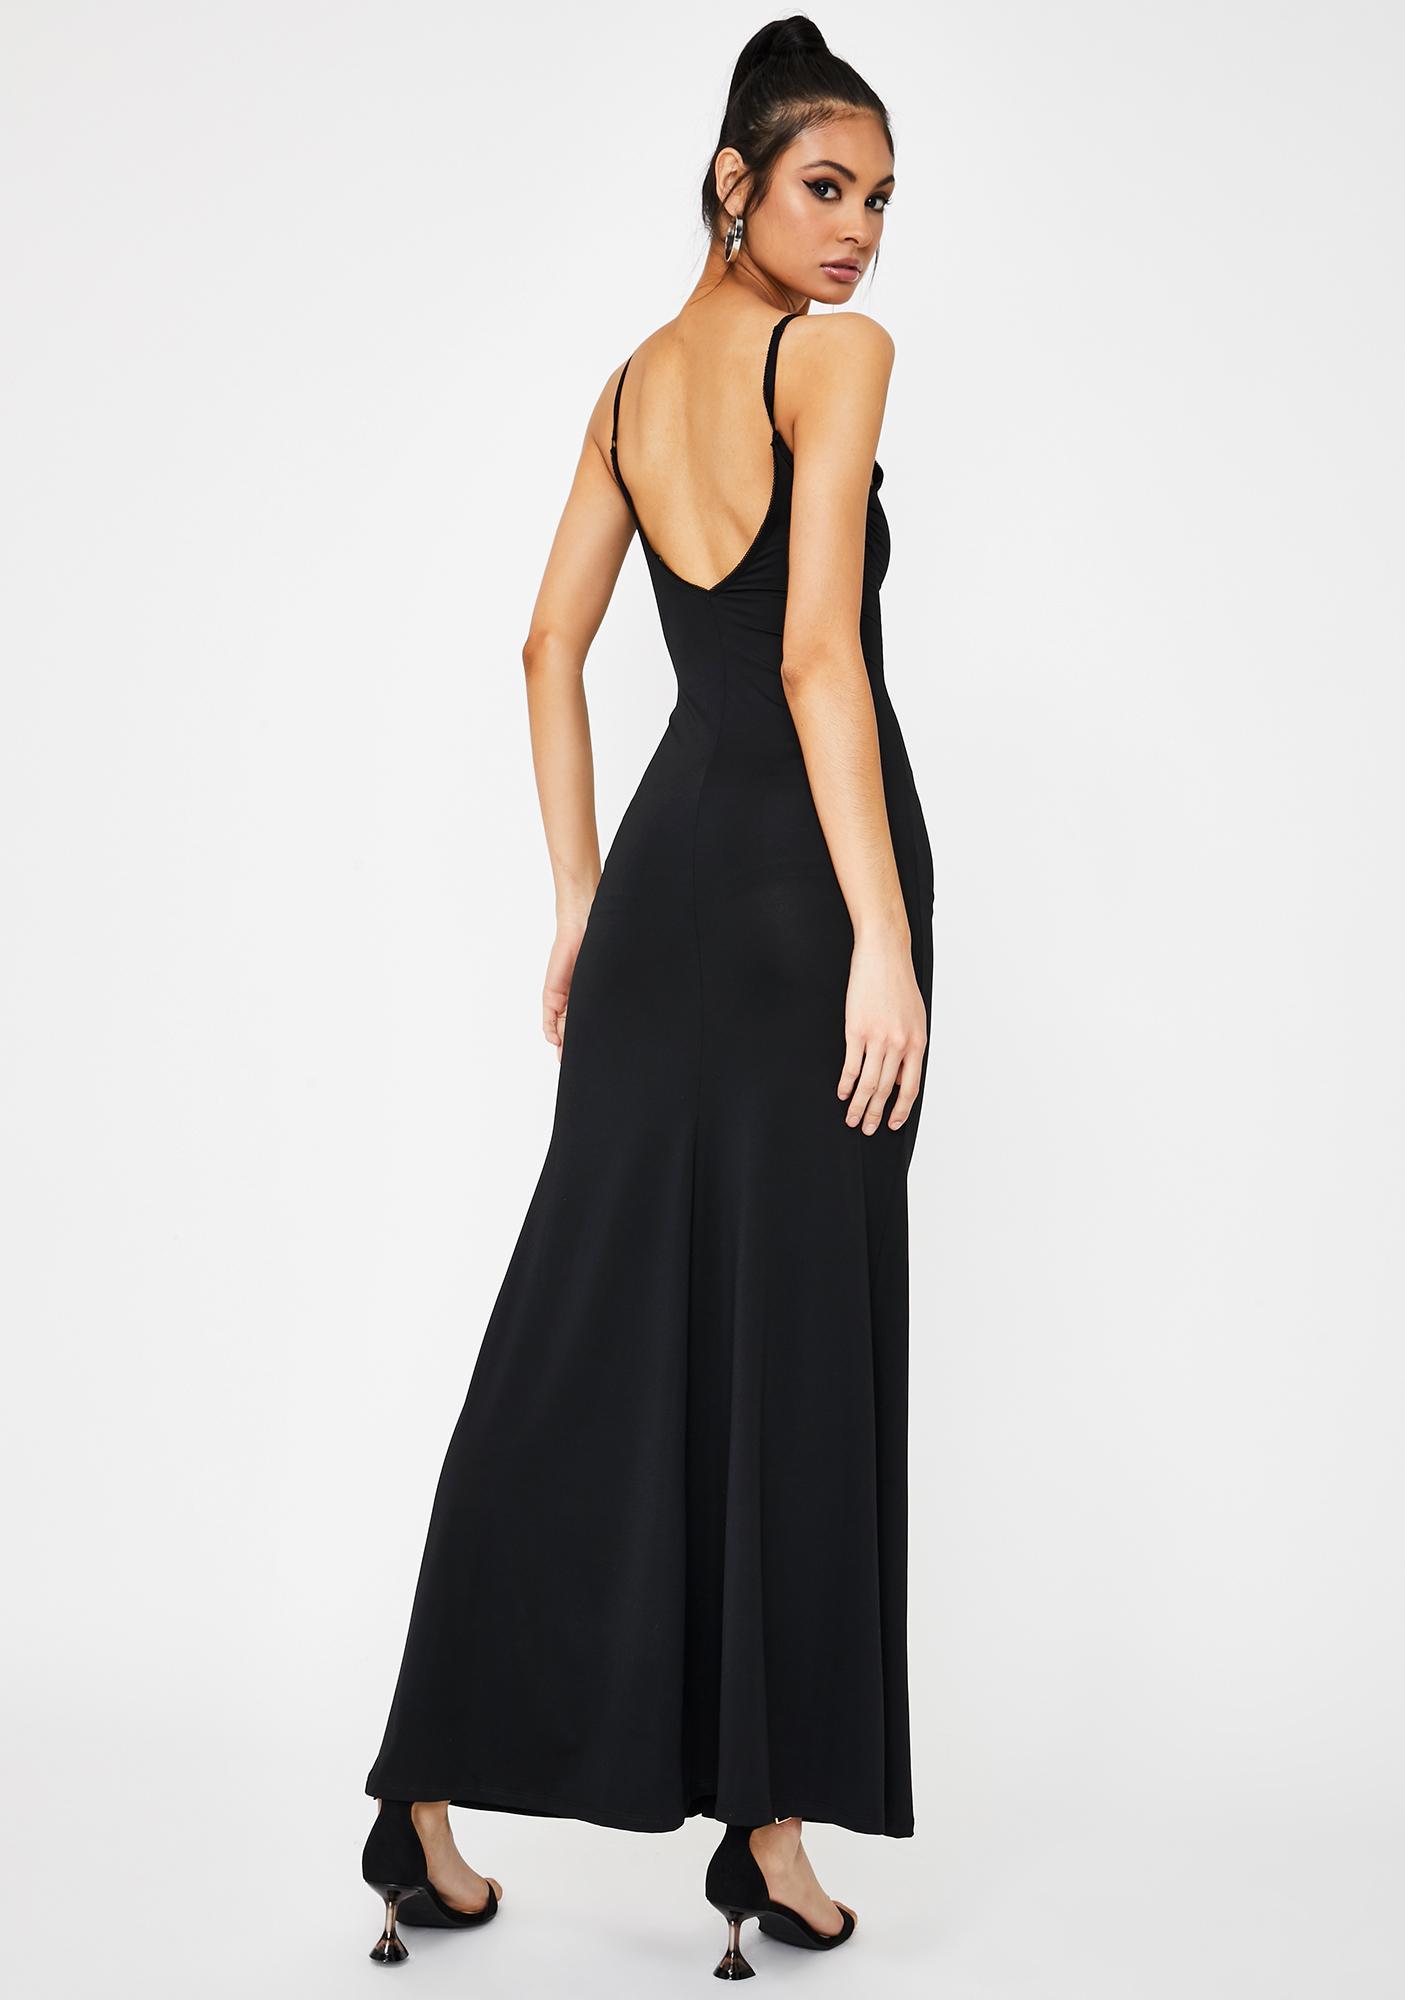 Kiki Riki Comin' Back 4 More Maxi Dress